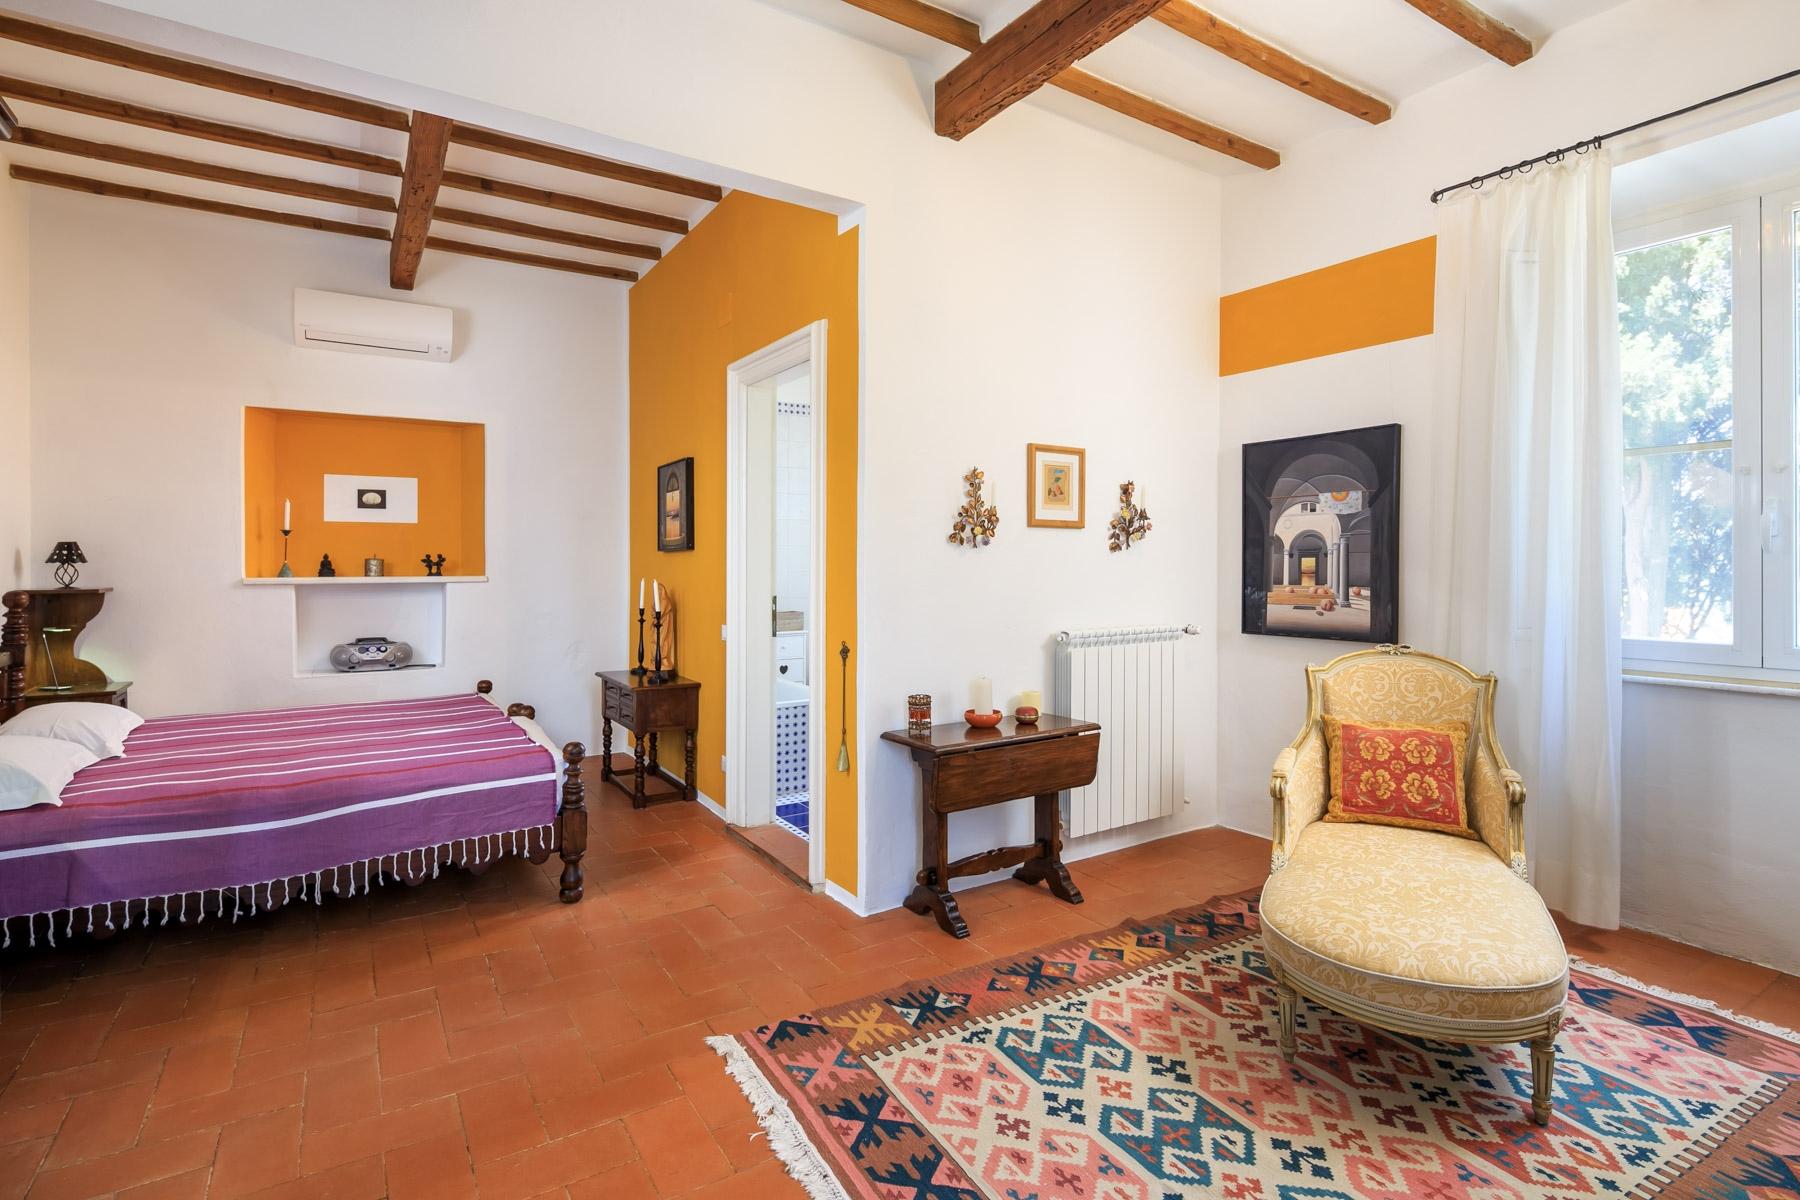 Villa in Vendita a Campiglia Marittima: 5 locali, 1100 mq - Foto 11